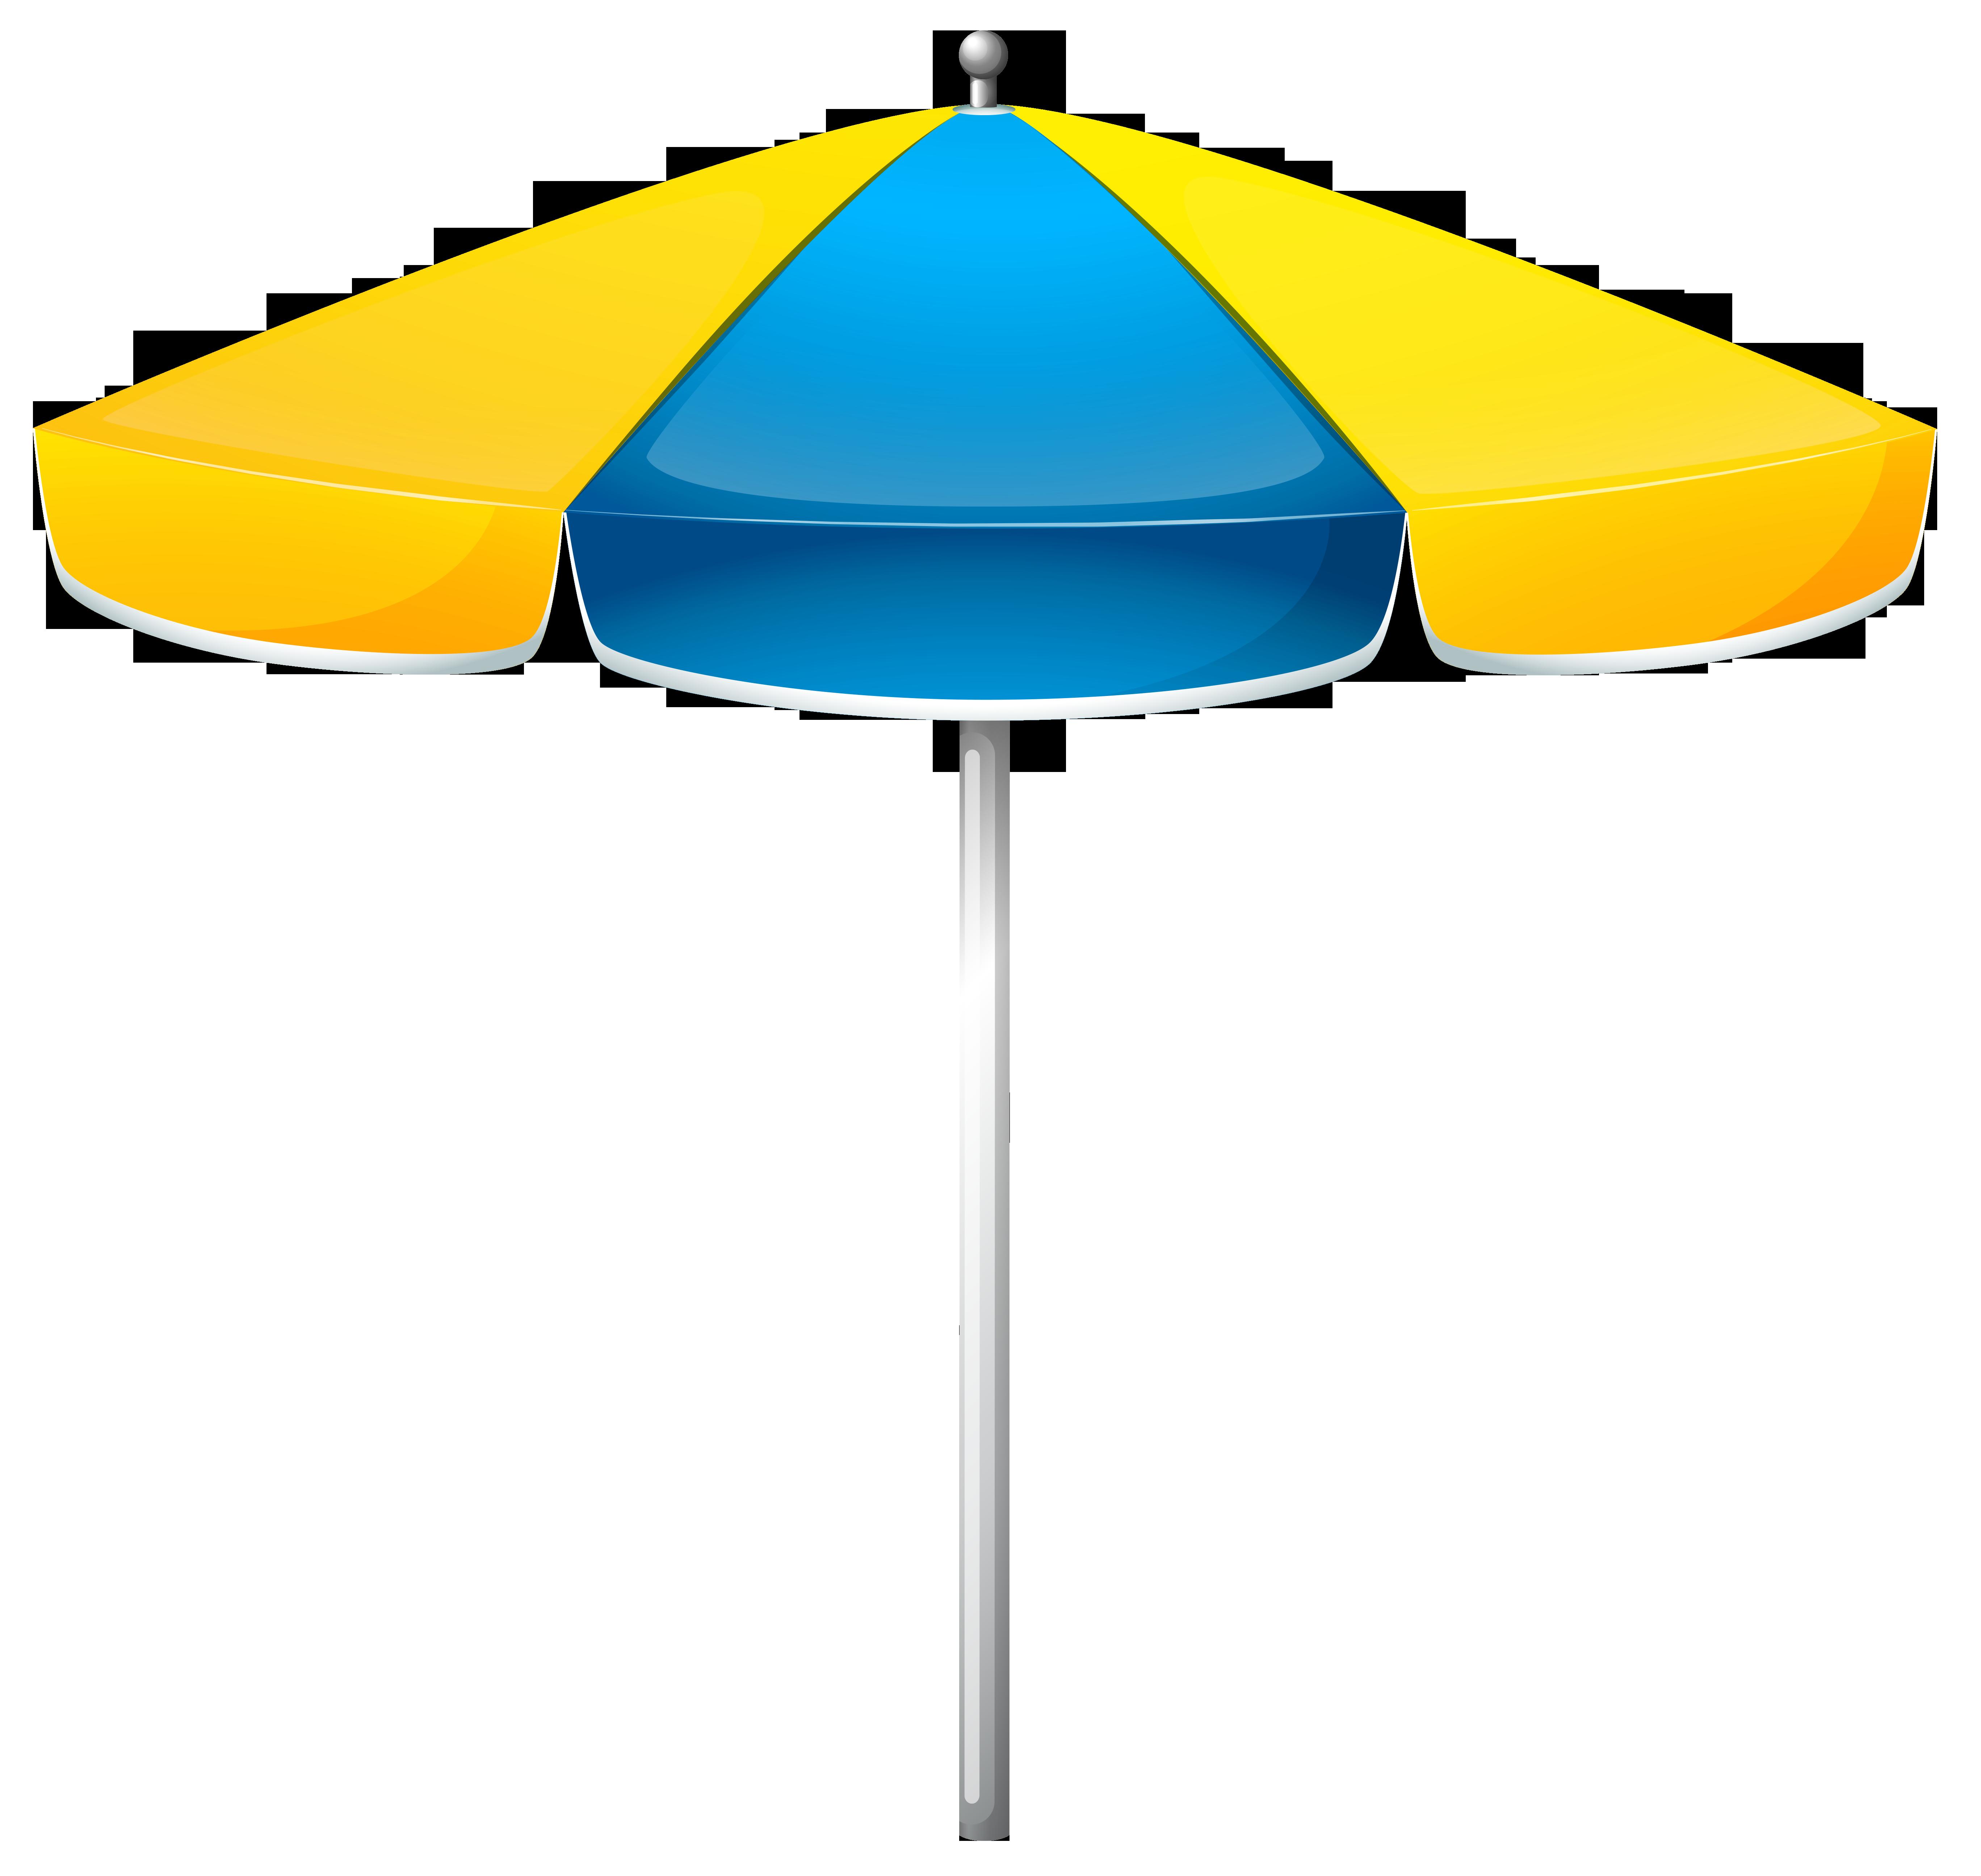 Beach umbrella with sun clipart banner freeuse Beach Umbrella Clipart Image Group (67+) banner freeuse